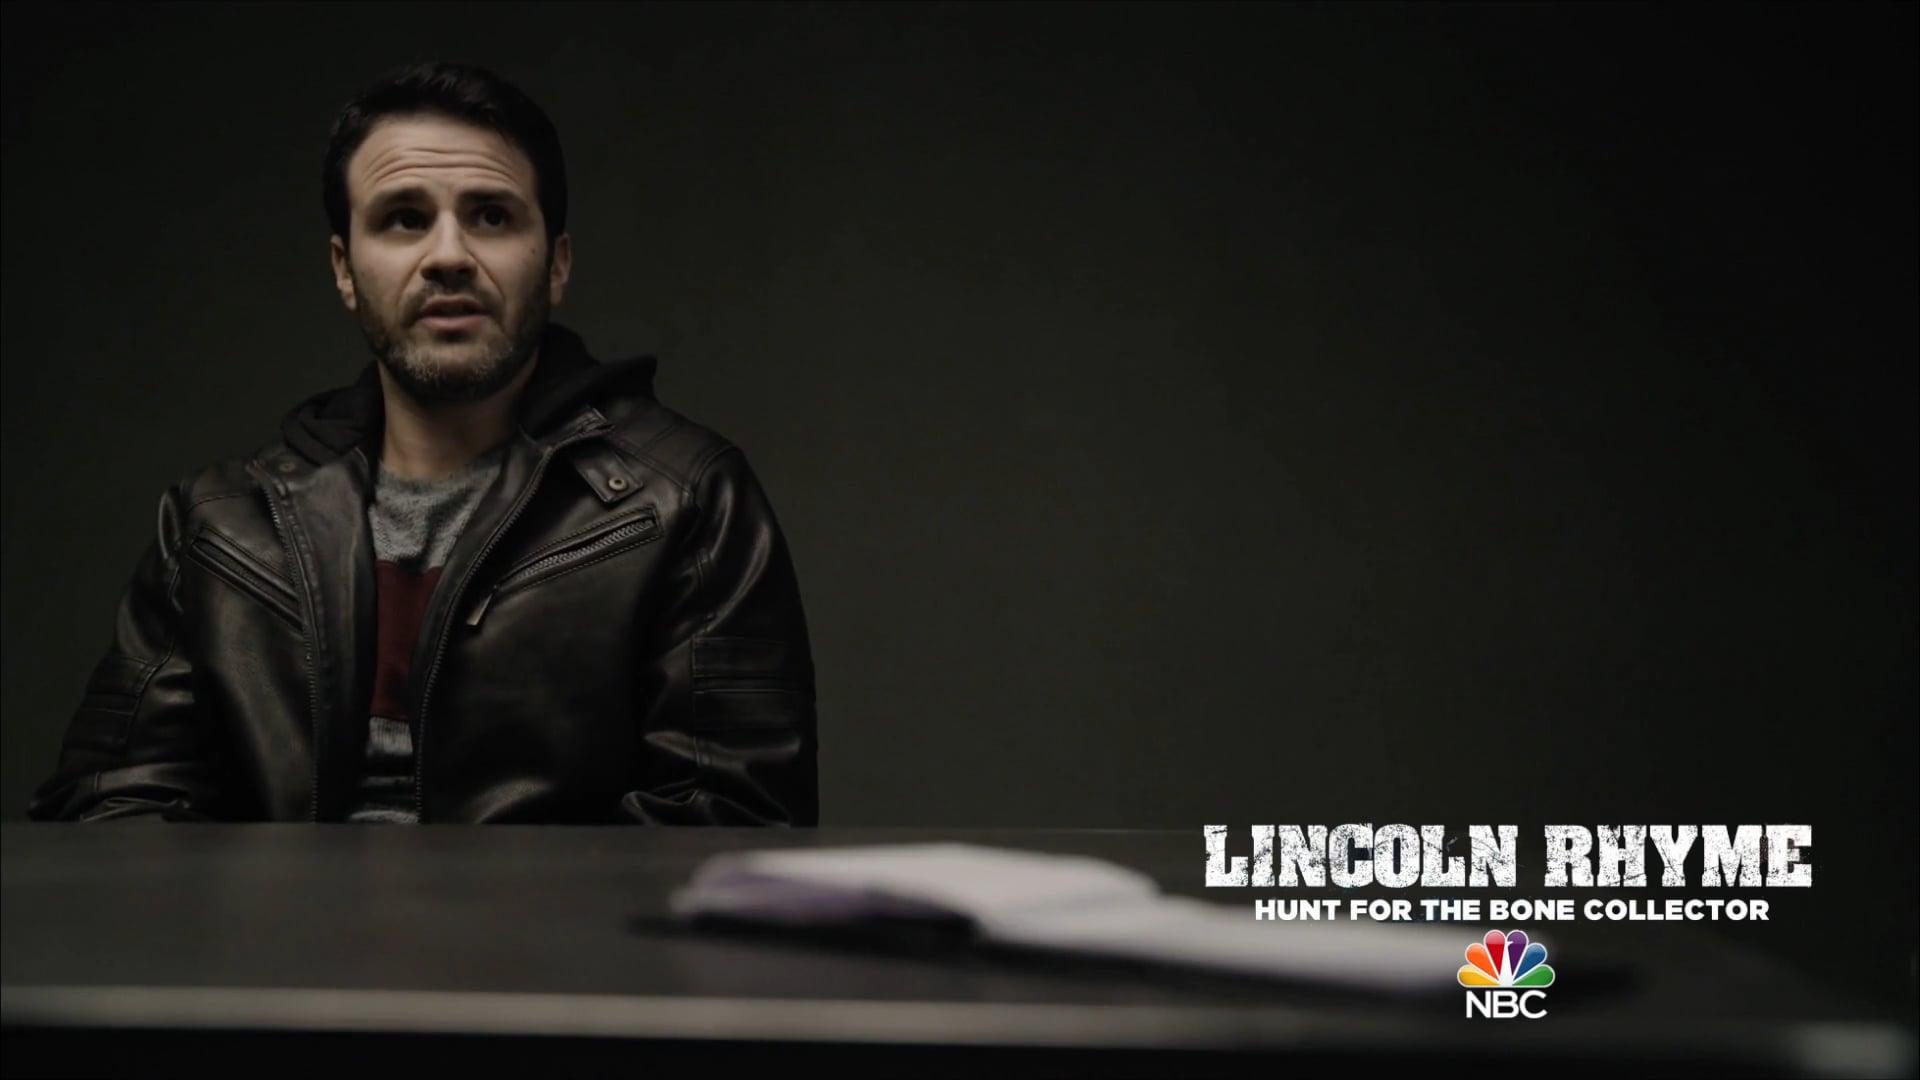 NBC's Lincoln Rhyme Bone Collector